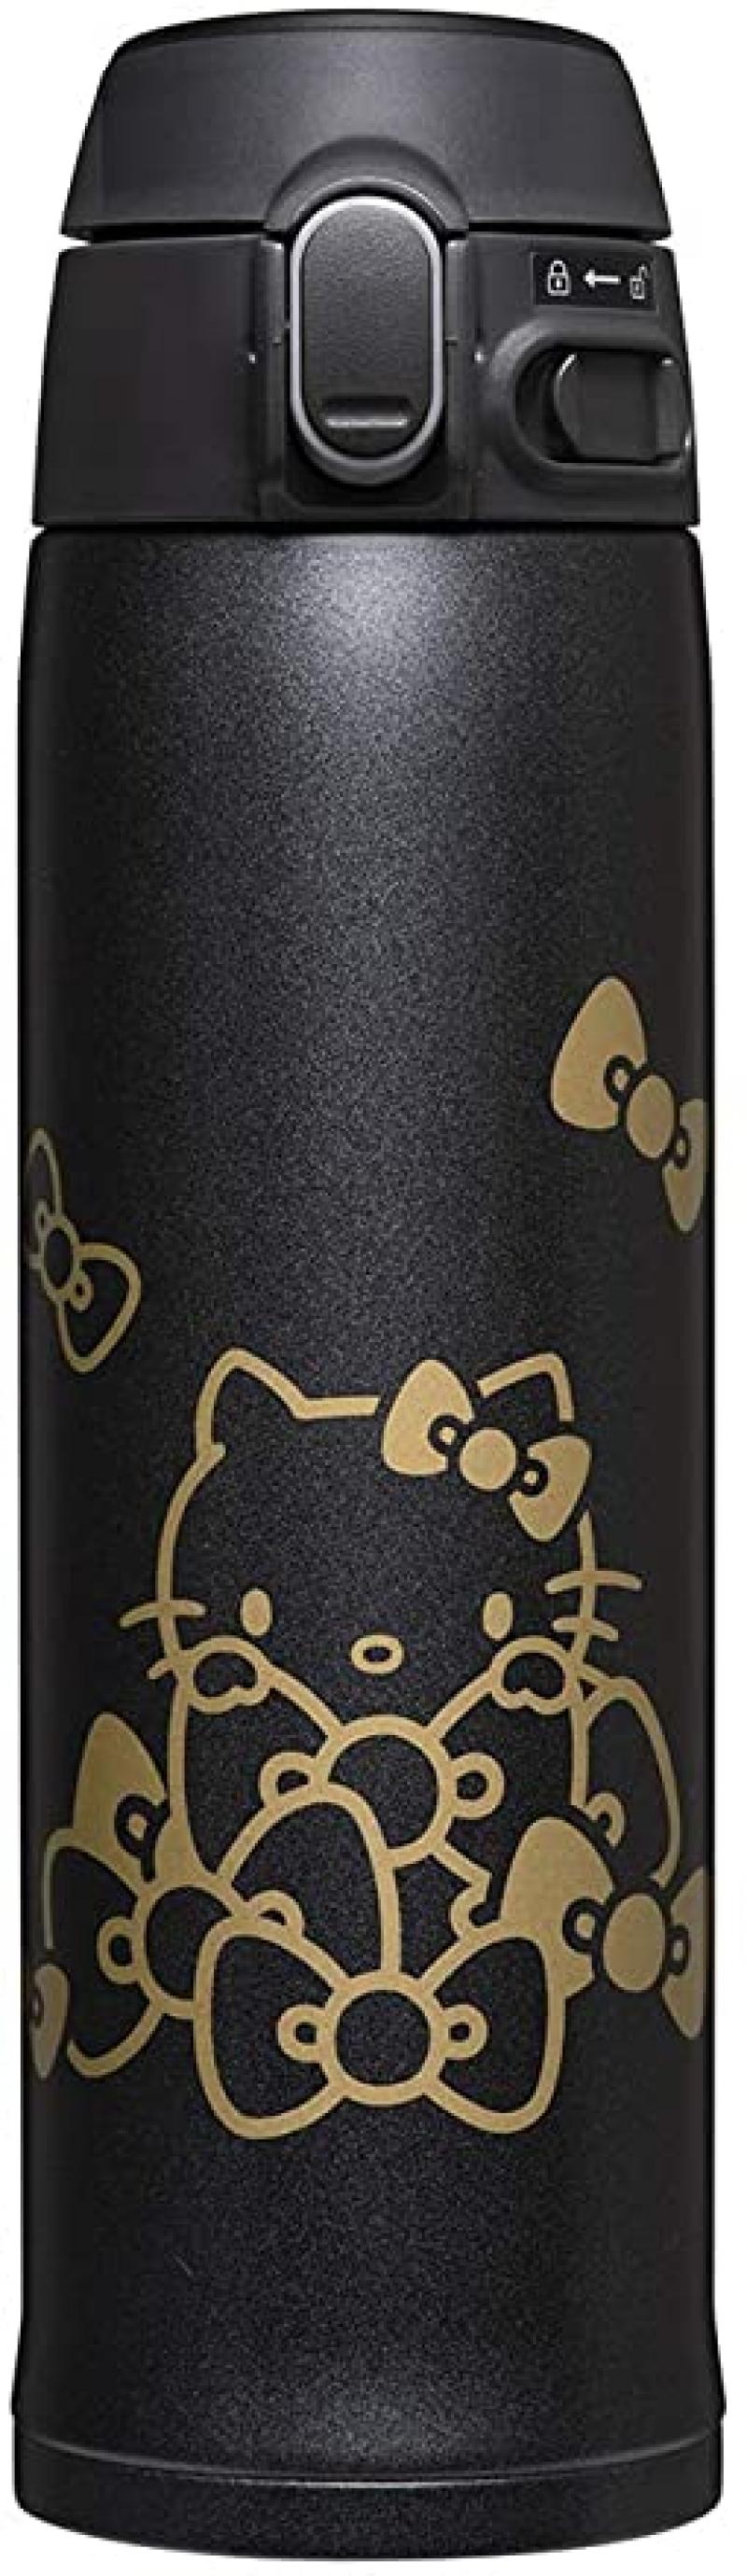 ihocon: Zojirushi象印 Hello Kitty 保溫杯 16 oz